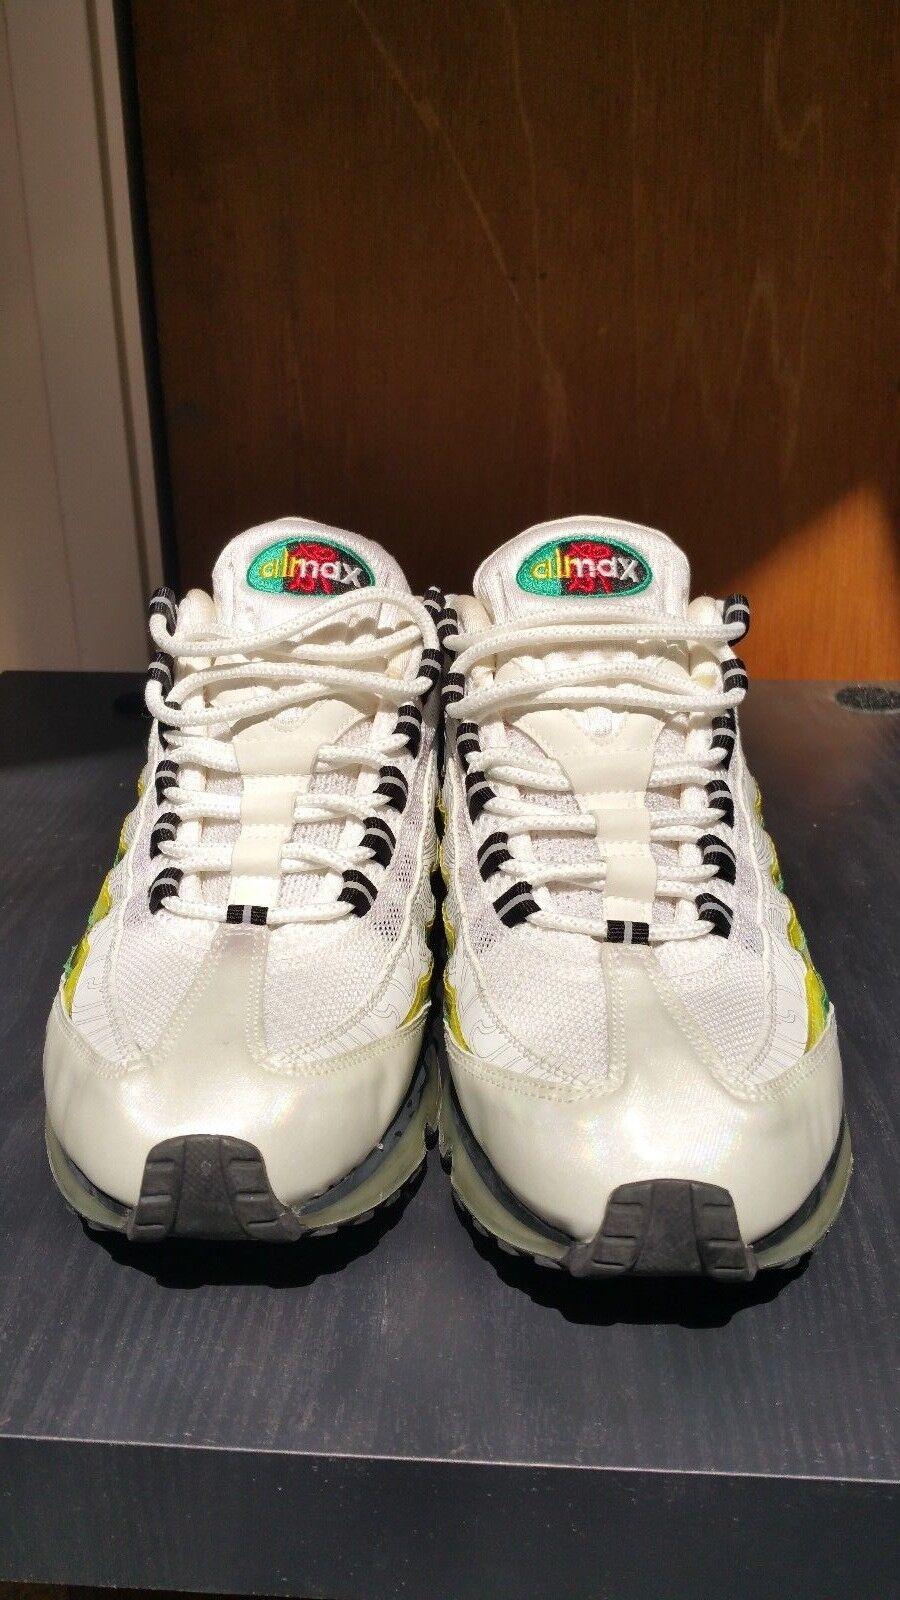 Men's Nike Airmax 95 360 air max US 9.5 MATSURI Japan Japanese 315859-101